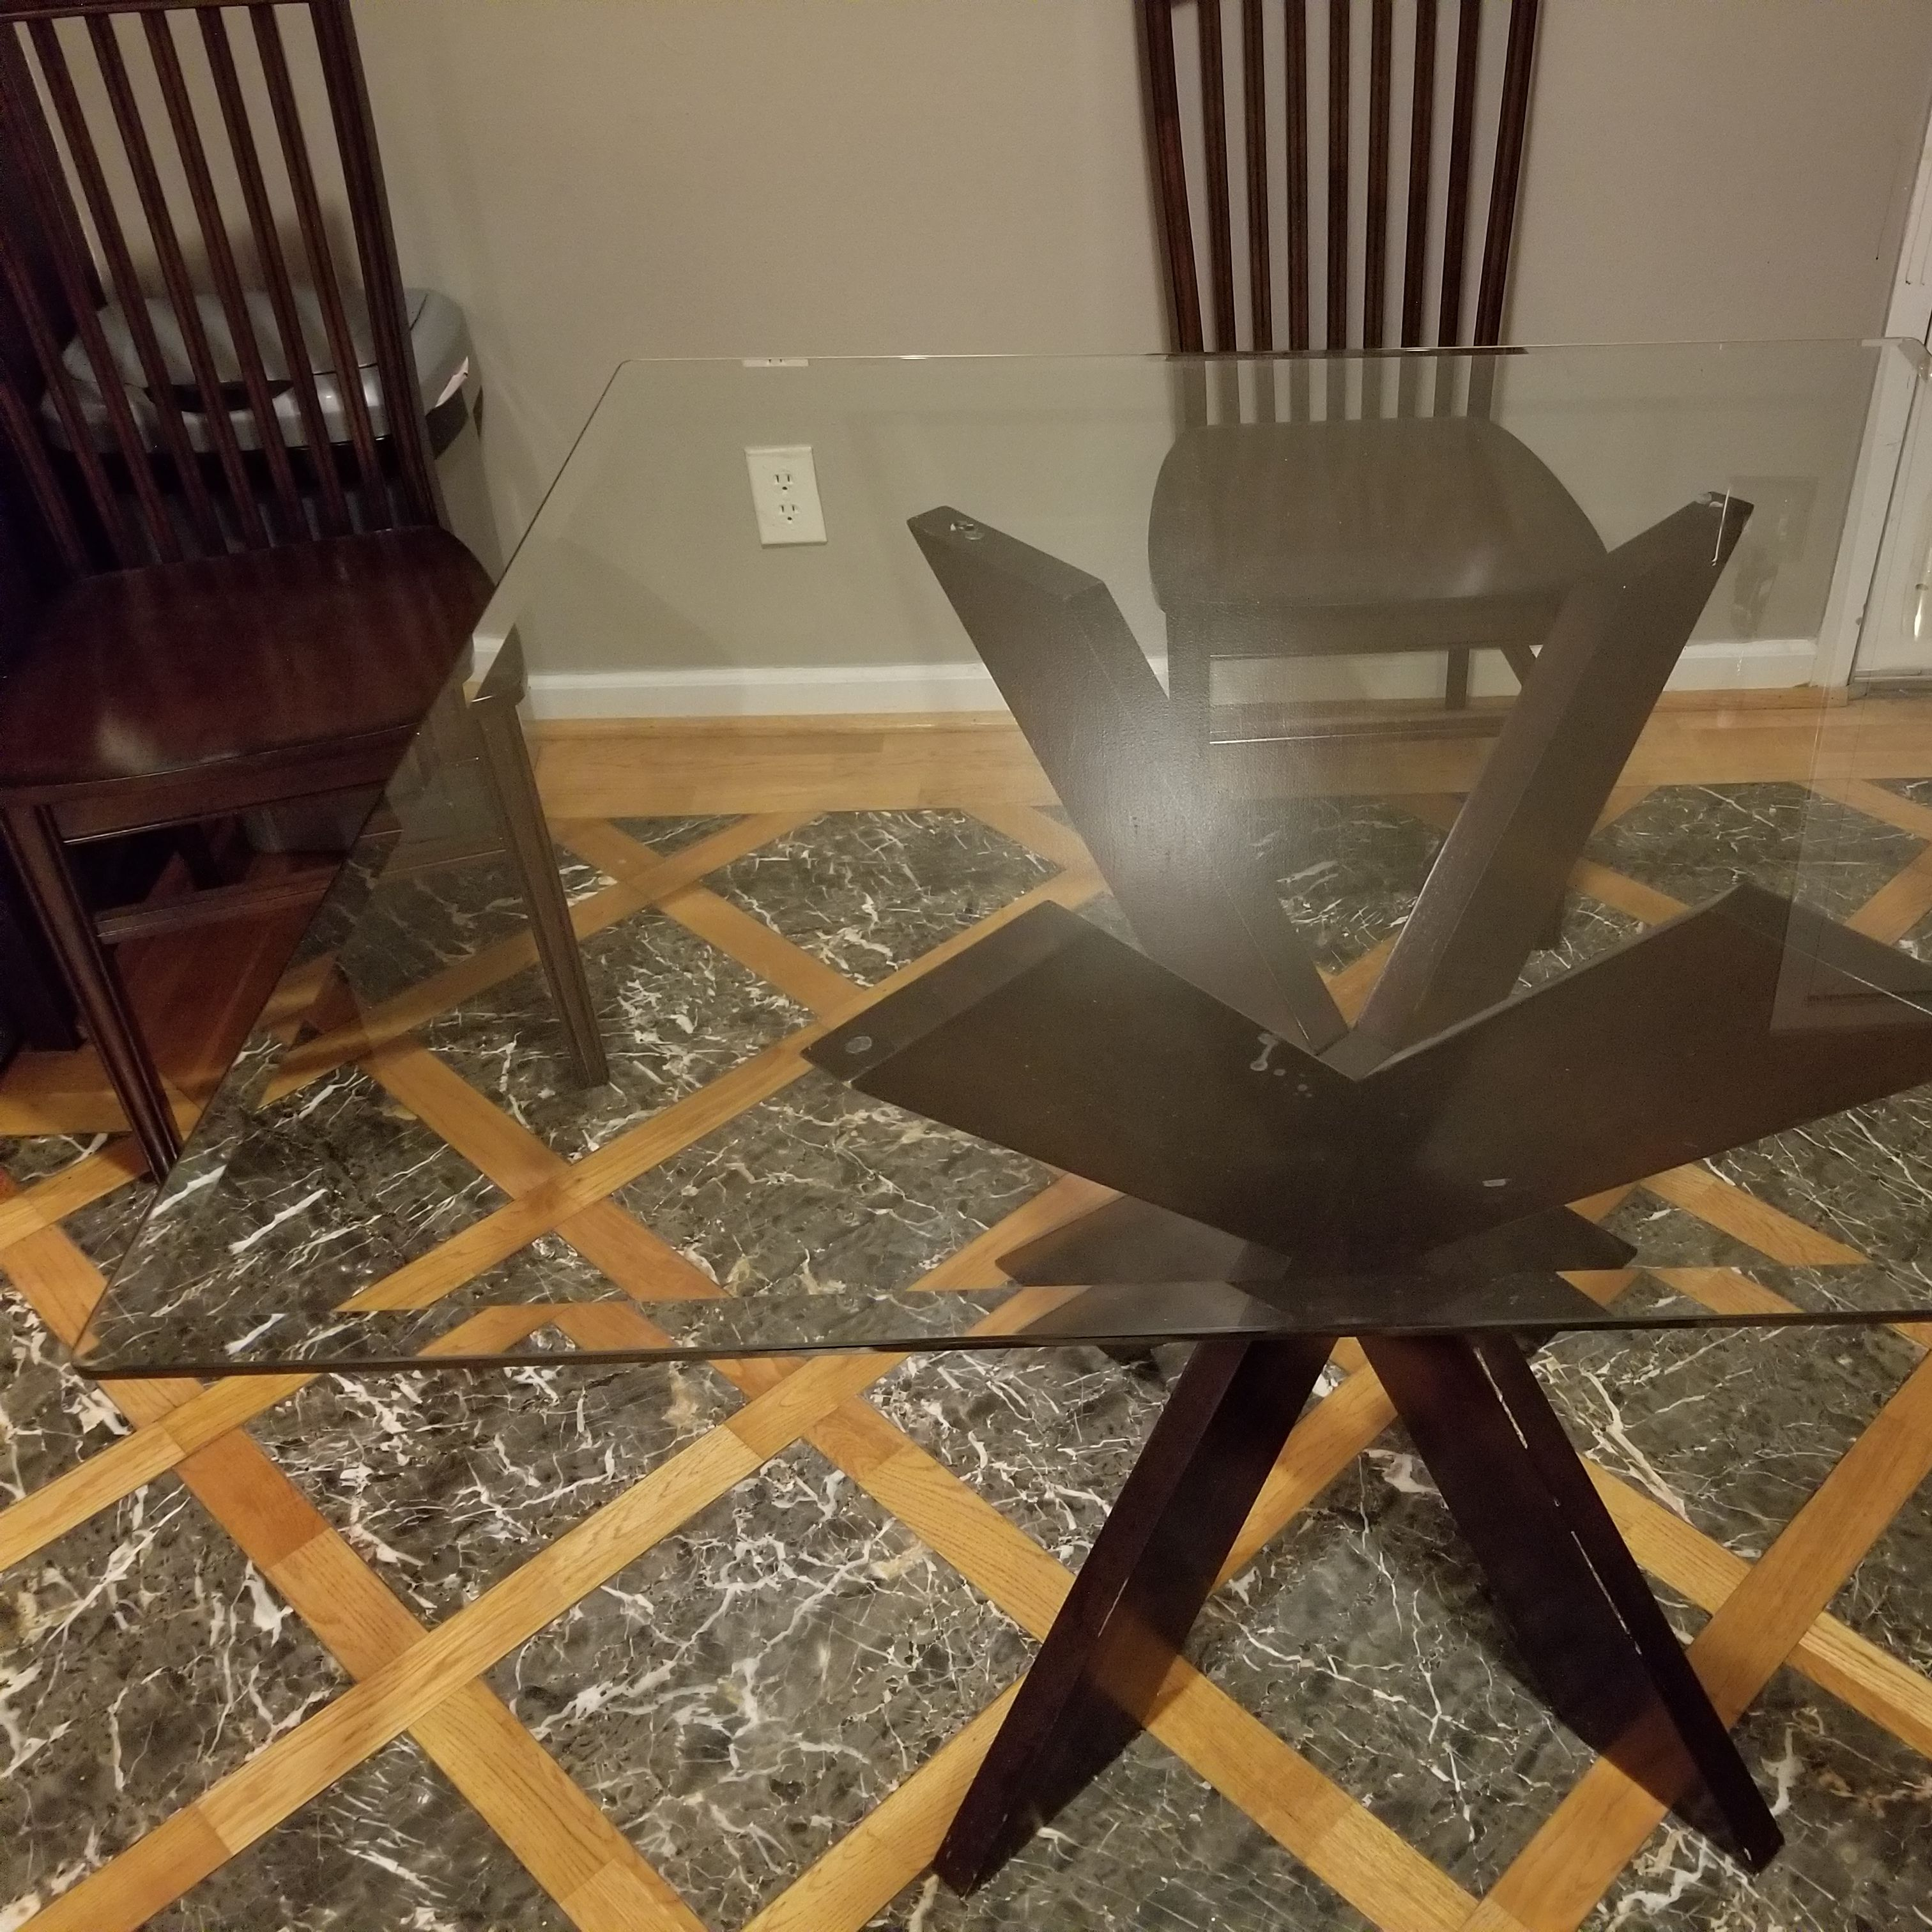 Simon Espresso X Dining Table W Square Glass Top Apartment Therapy S Bazaar